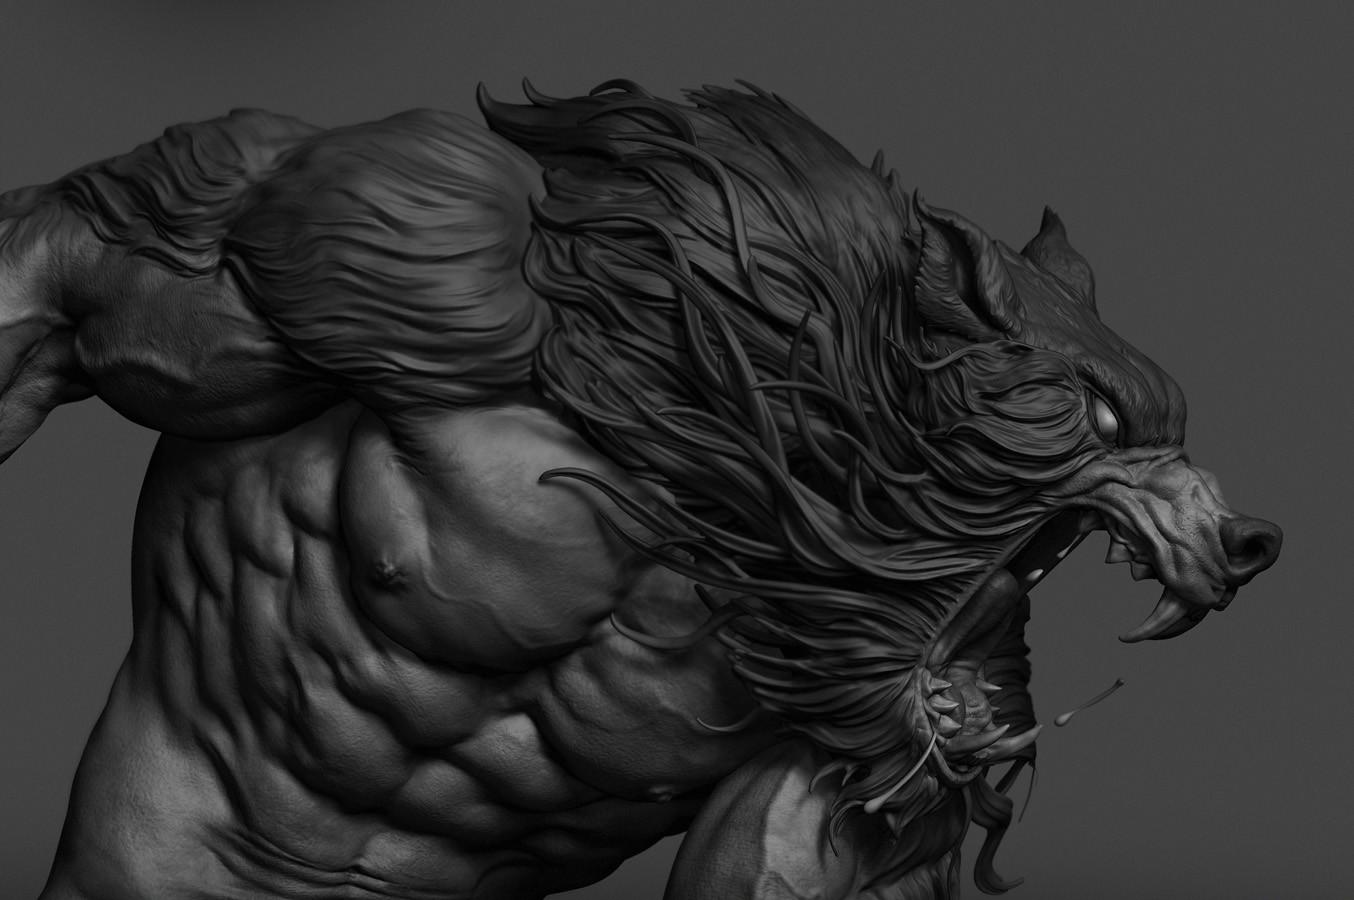 Tiago rios werewolf 02